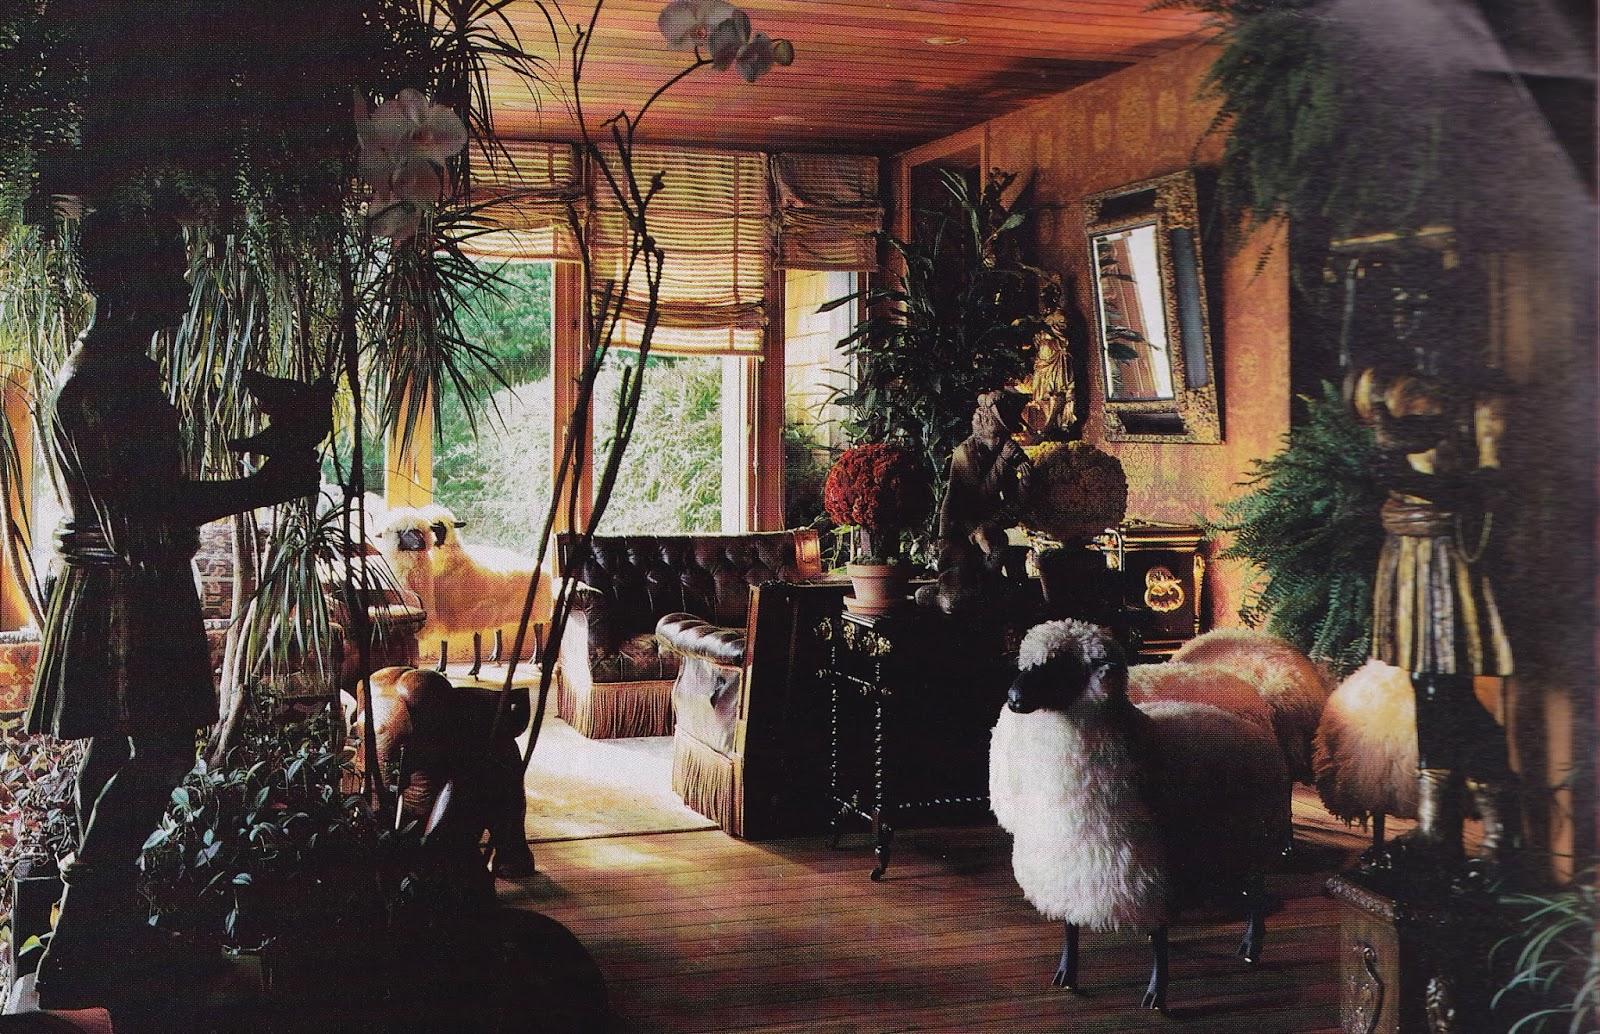 Chalet Nursery And Garden Center: Cristopher Worthland Interiors